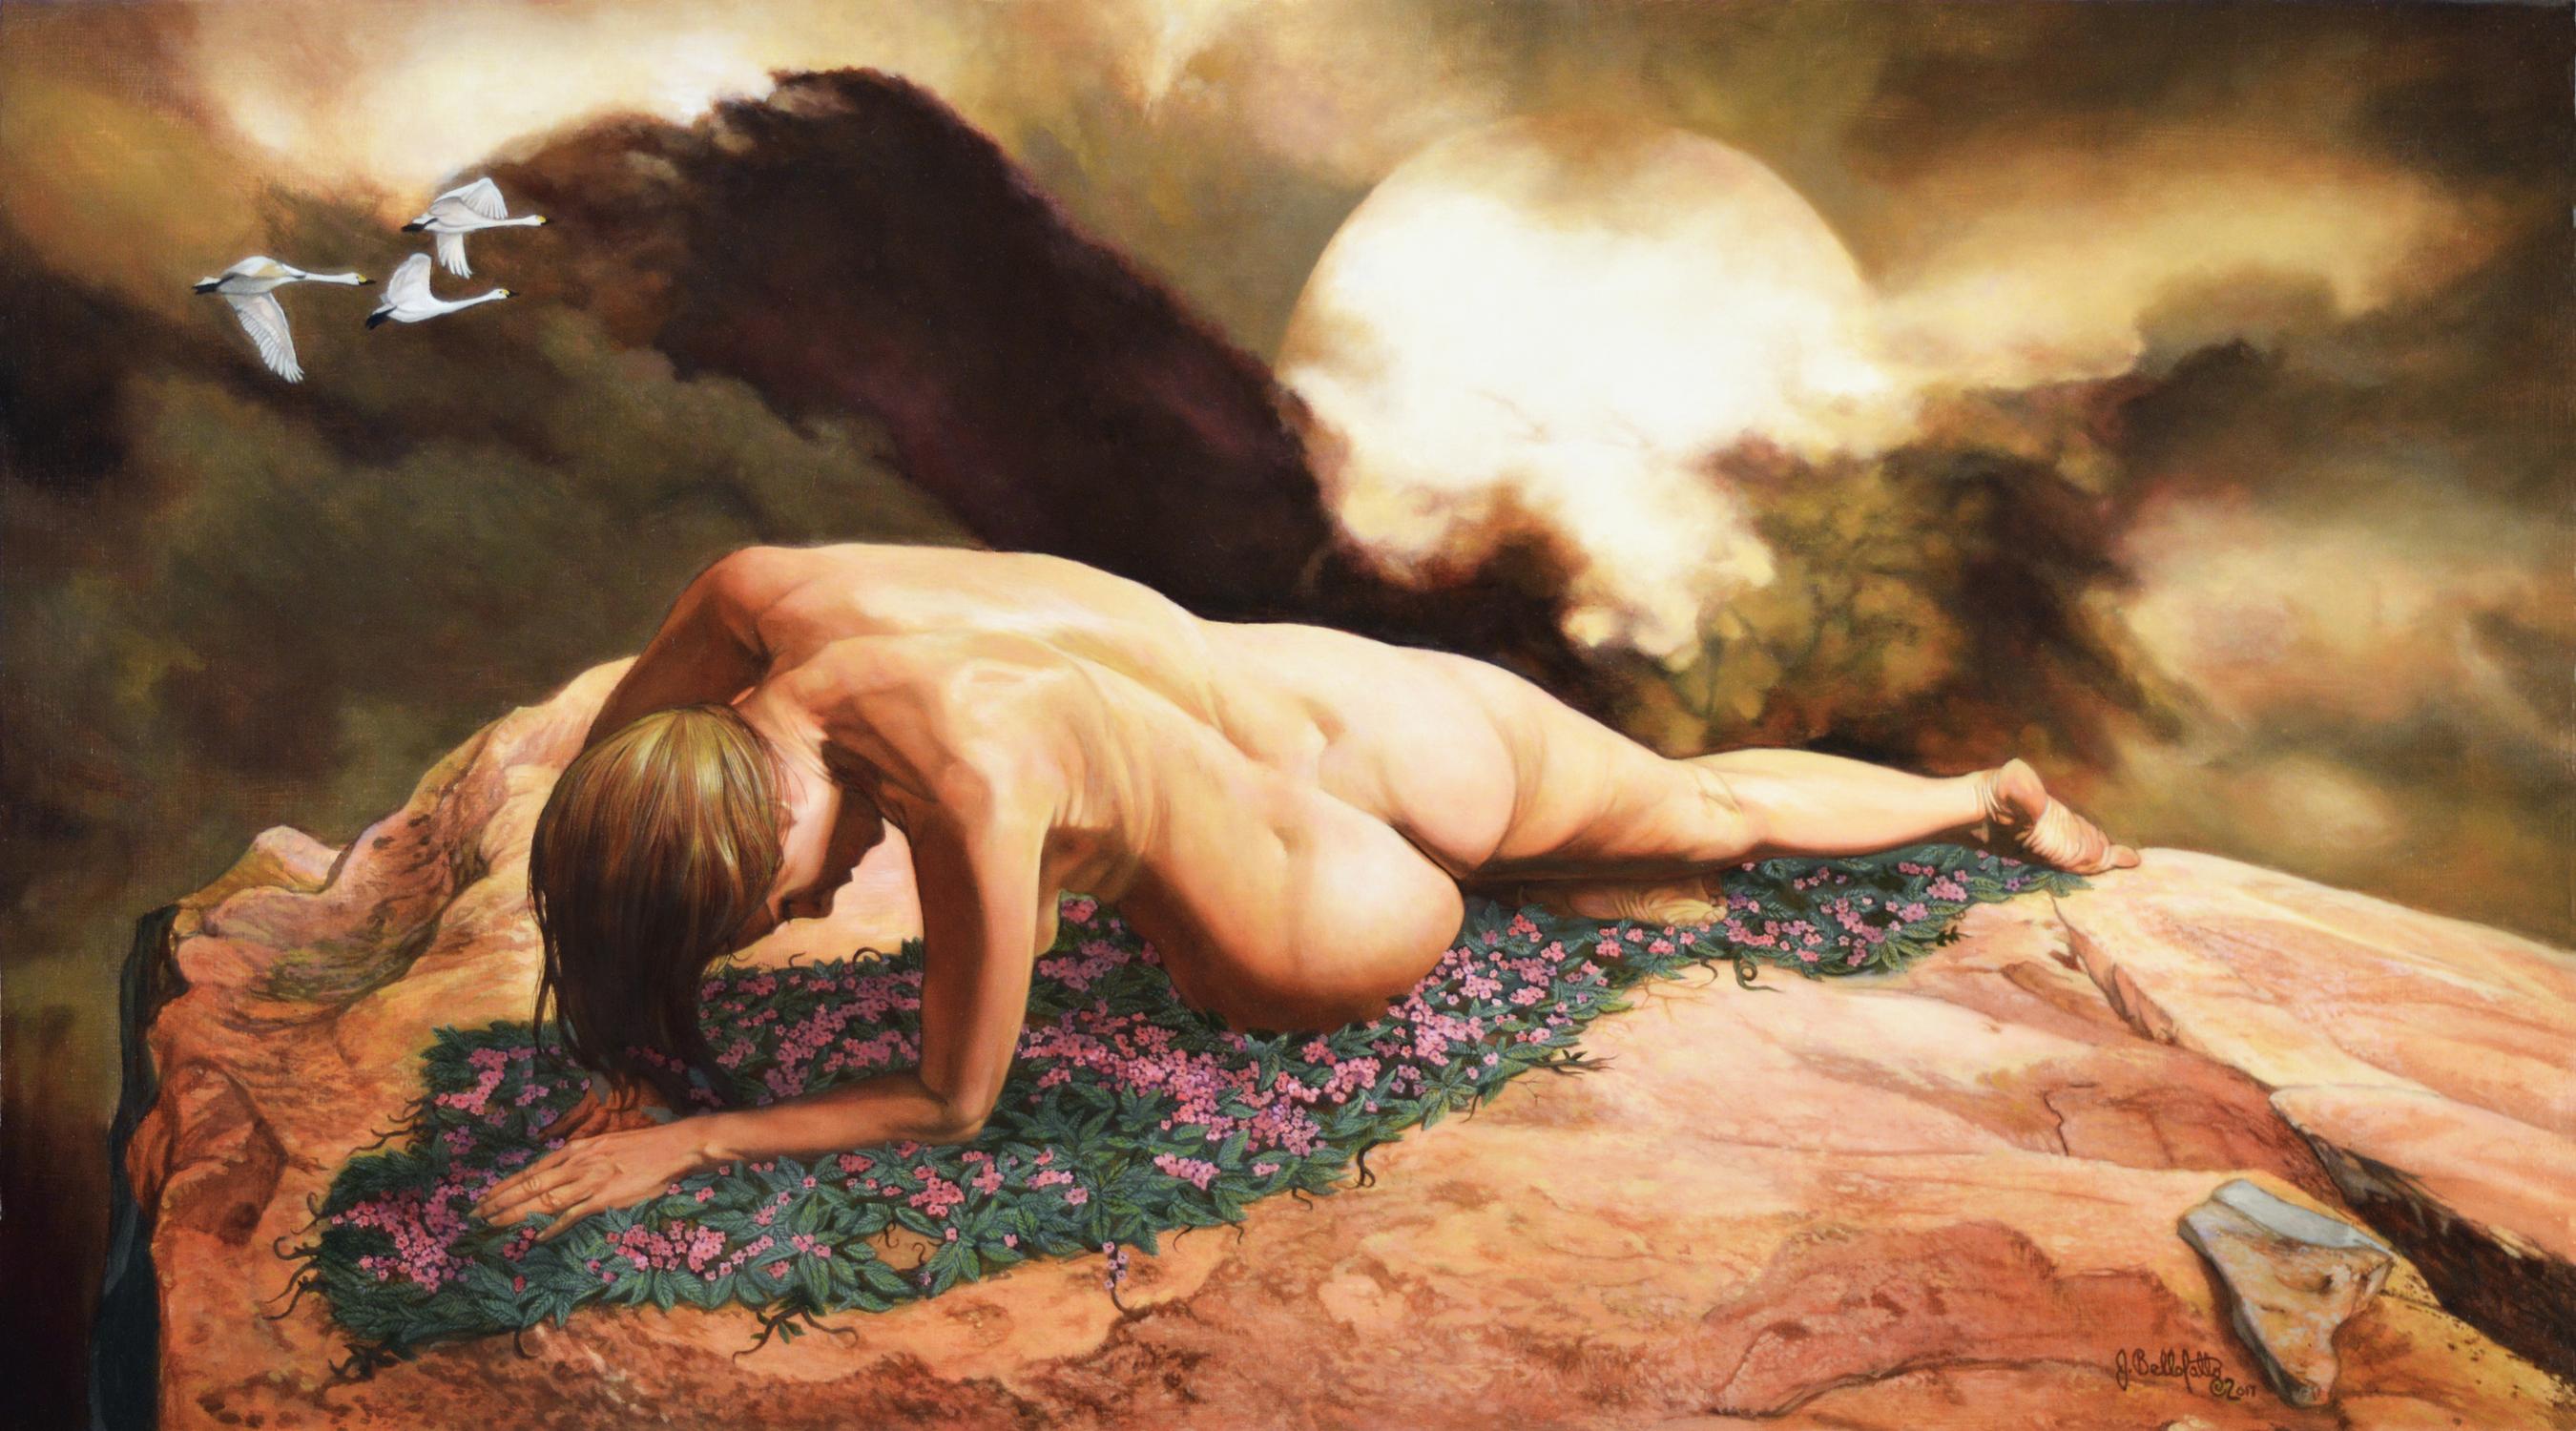 Clytie Artwork by Joseph Bellofatto